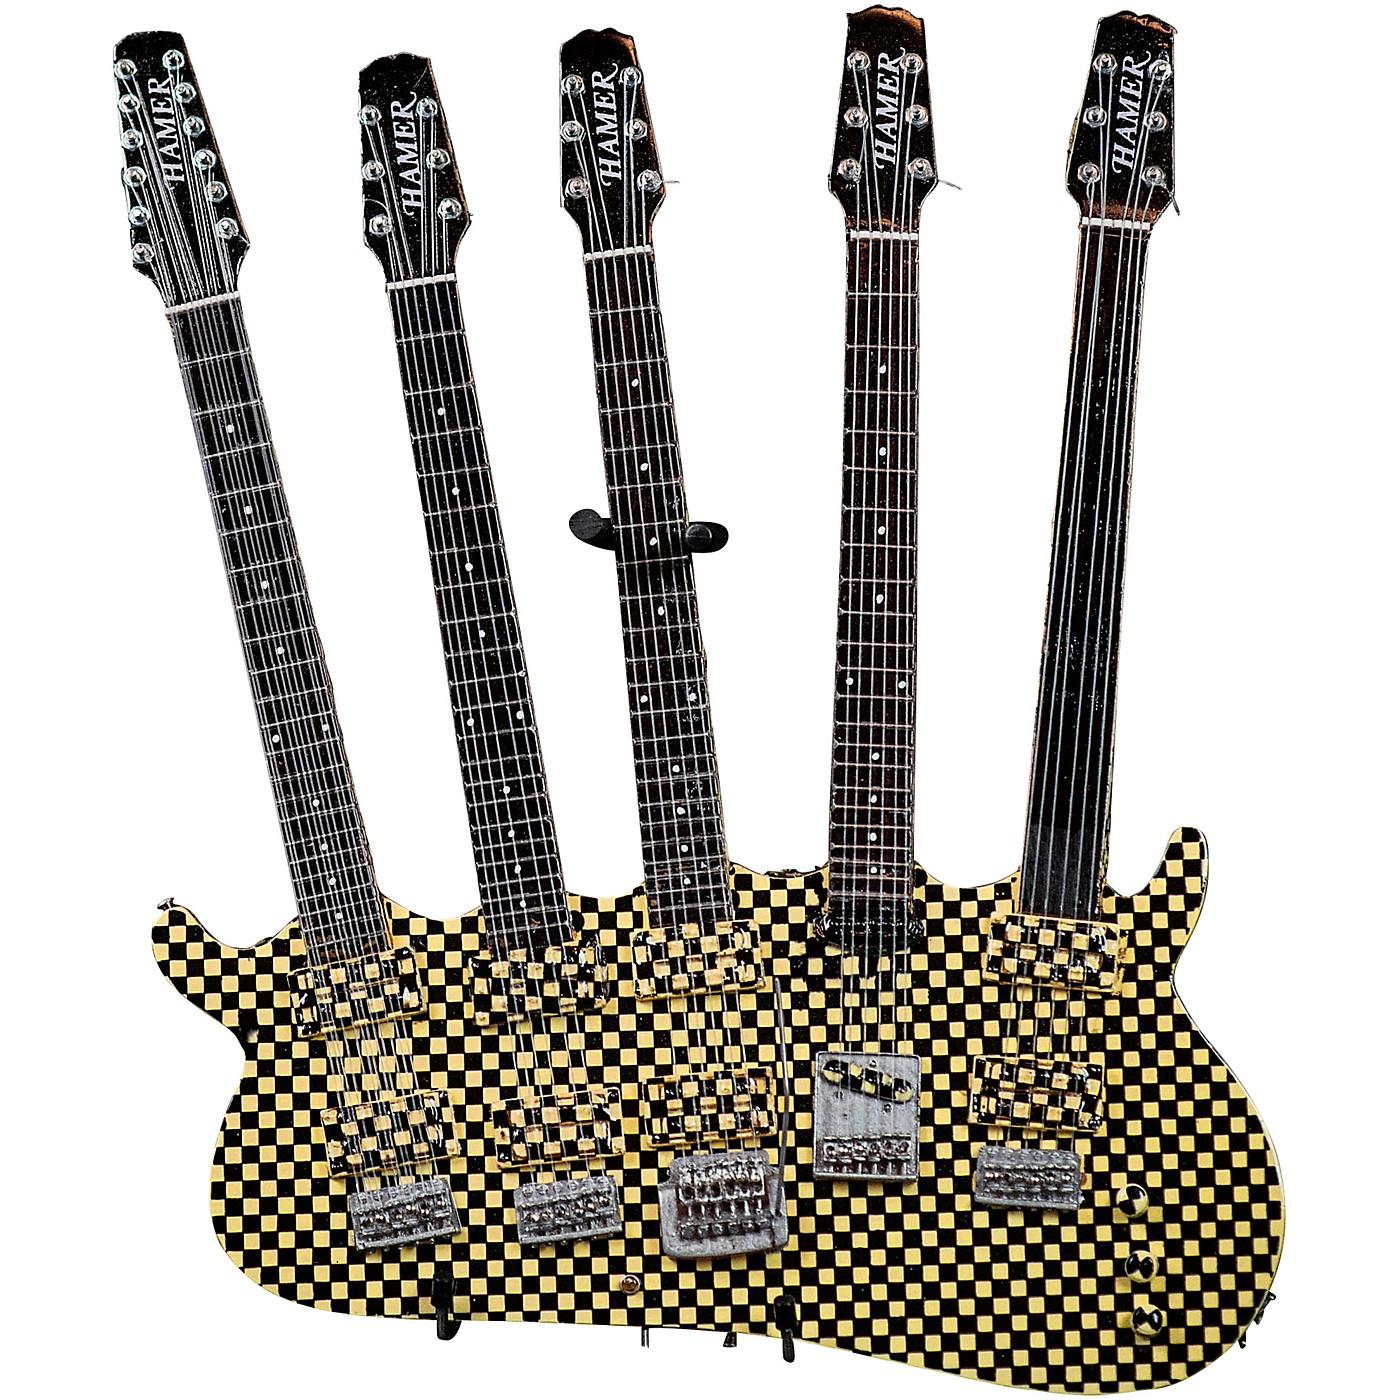 Hal Leonard Rick Nielsen 5-Neck Checkered Model Miniature Guitar Replica thumbnail